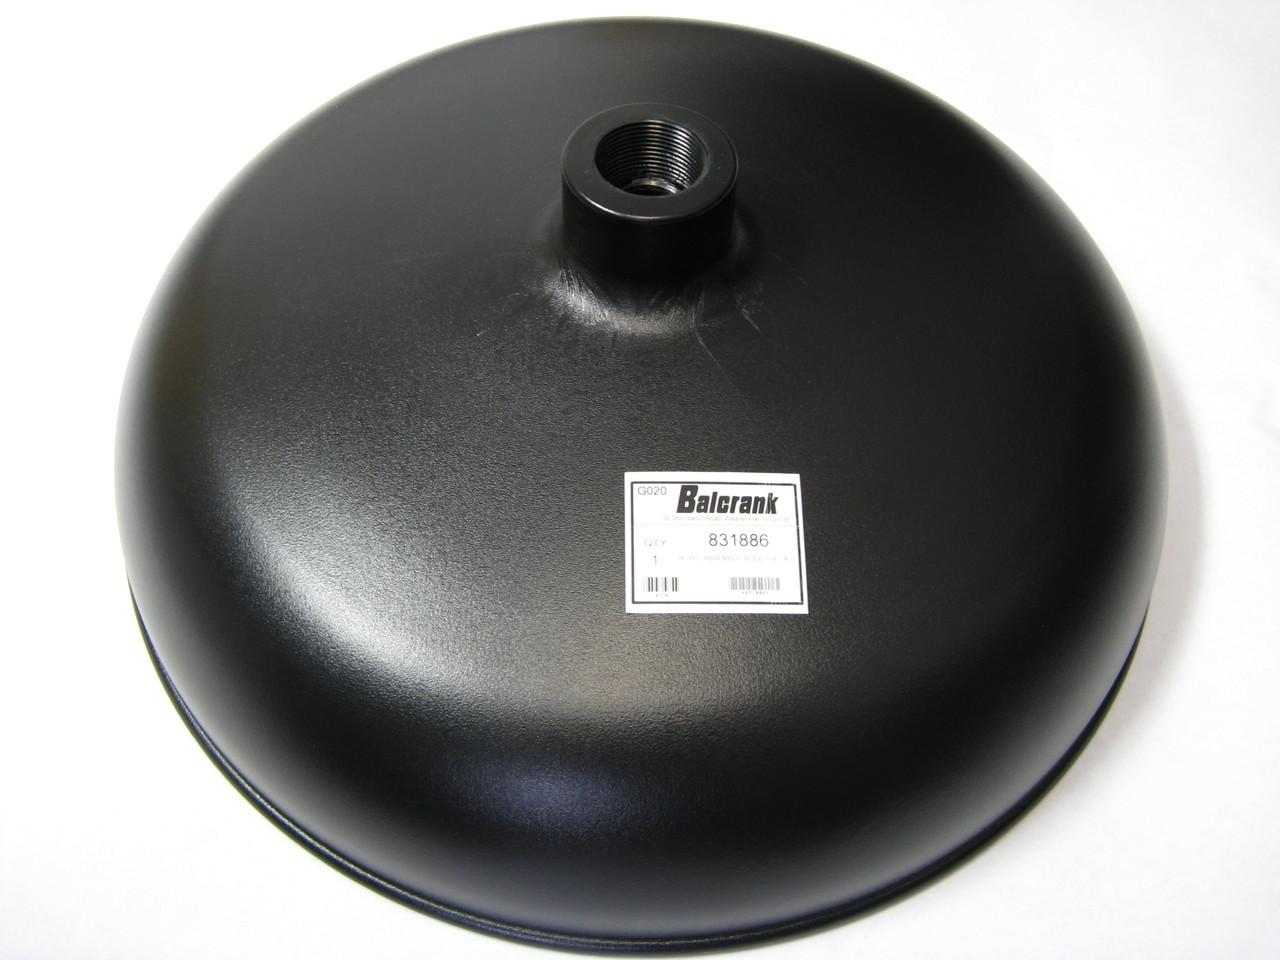 831886 Balcrank Bowl Funnel for Waste Oil Drain 4140-064